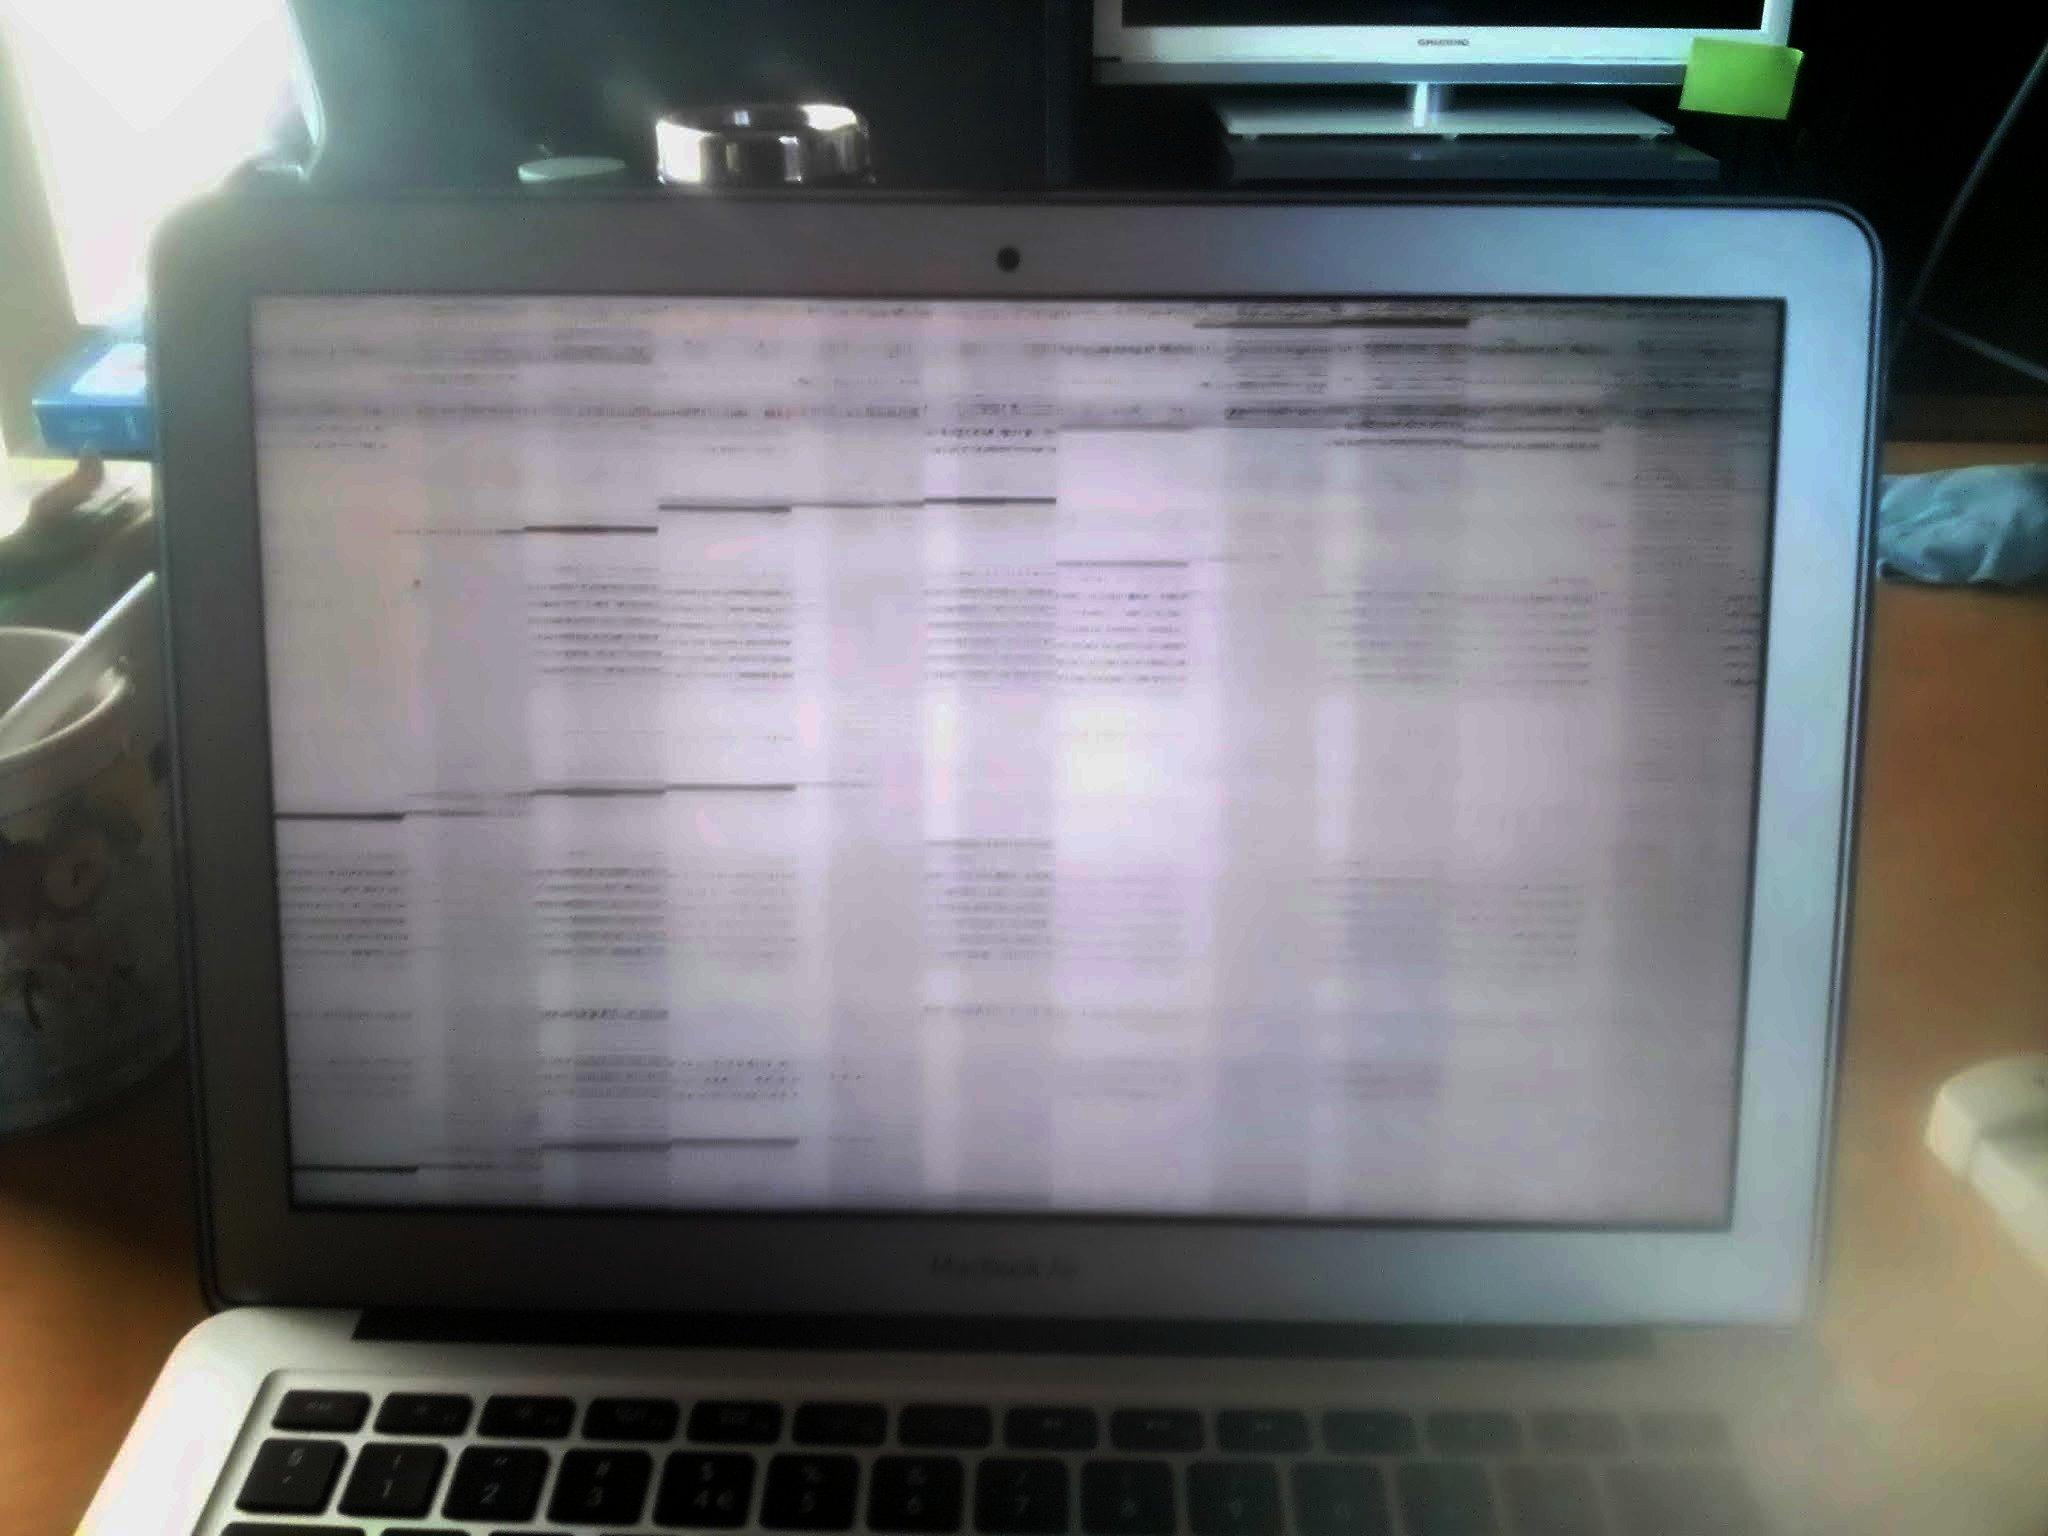 Macbook Air (Haswell) screen tearing on wake | MacRumors Forums